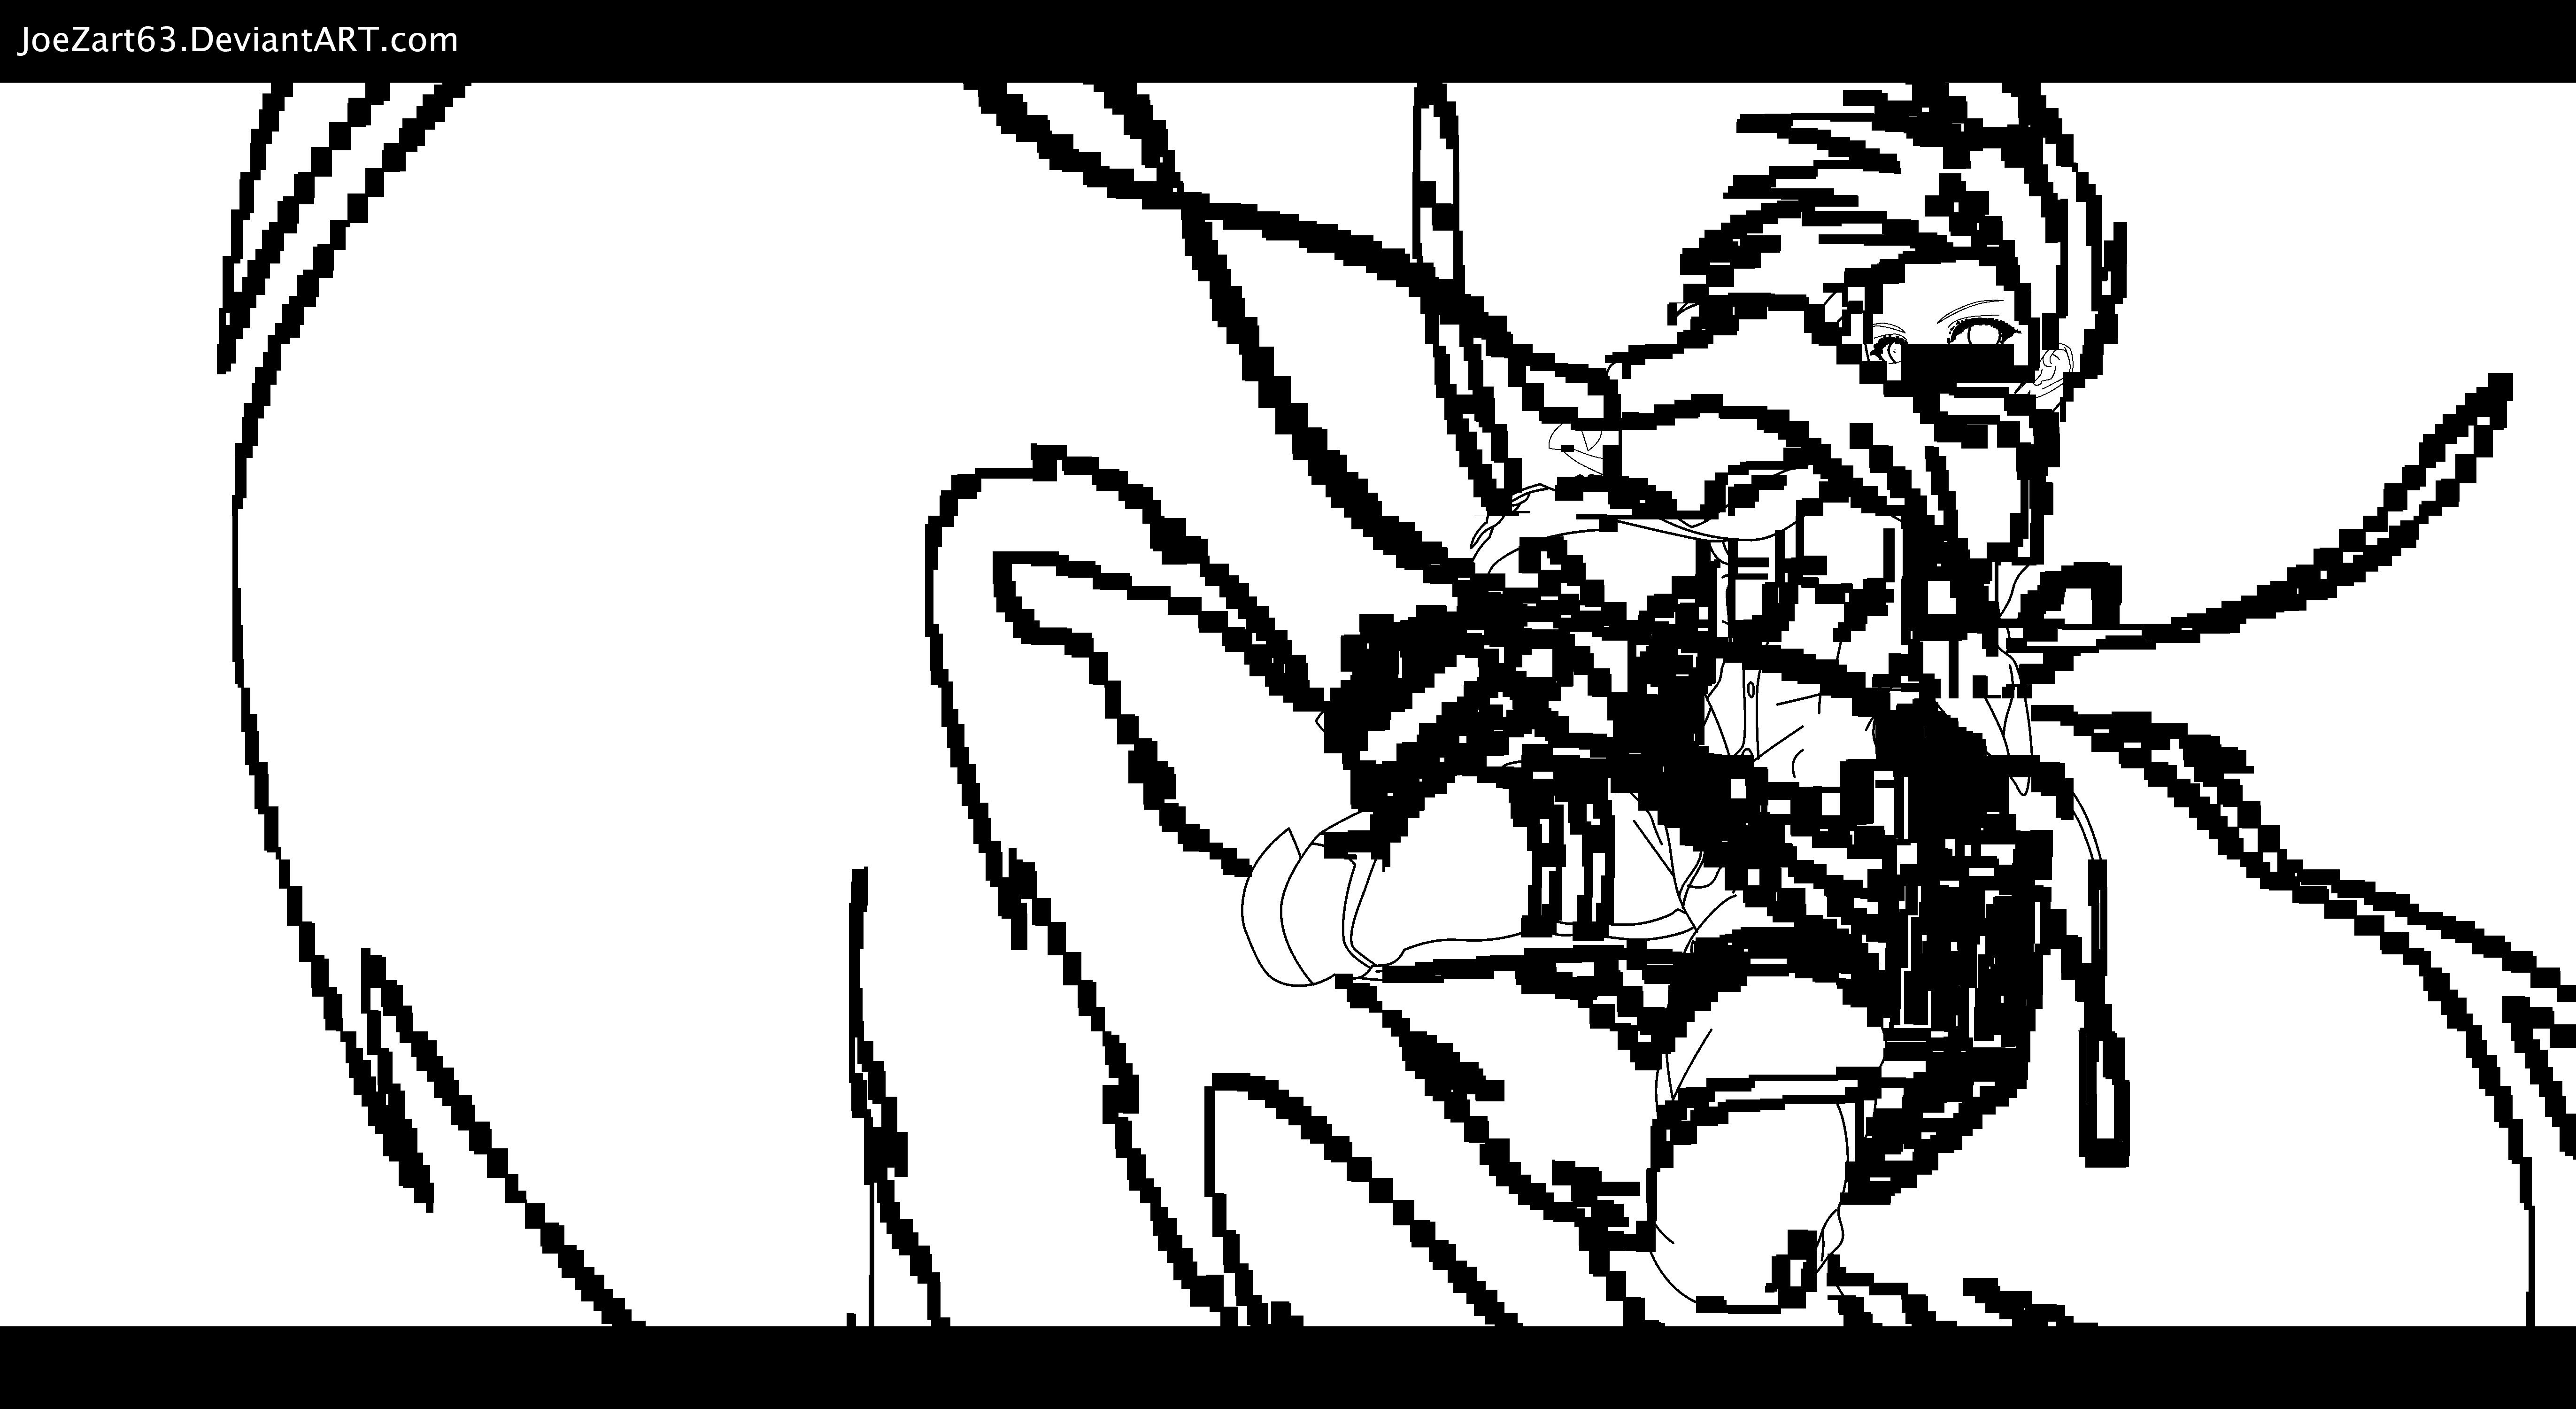 Line Art Anime : Mikasa ackerman lineart by joezart on deviantart